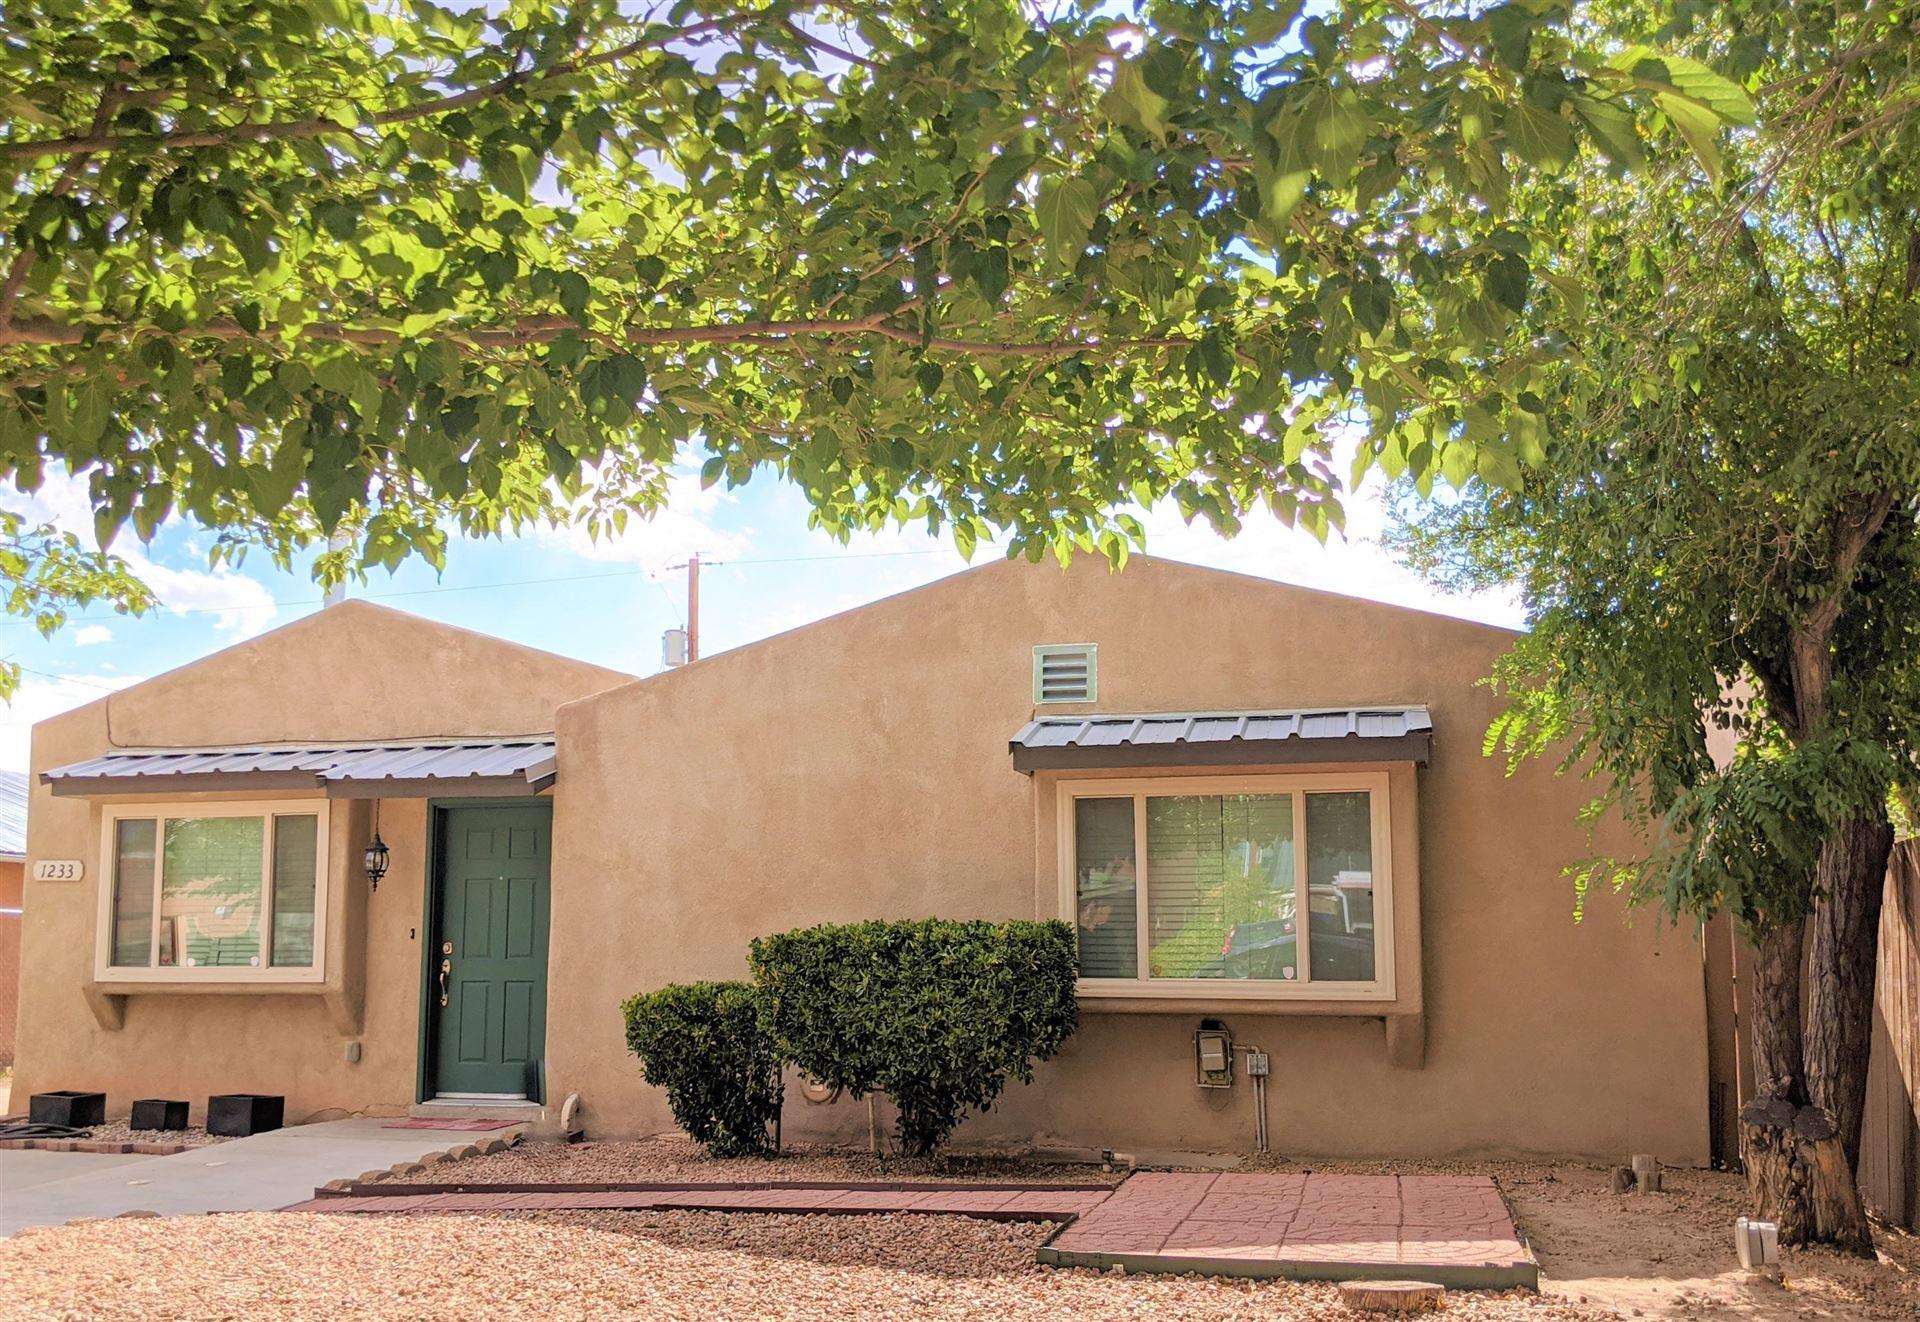 1233 8TH Street NW, Albuquerque, NM 87102 - #: 970319